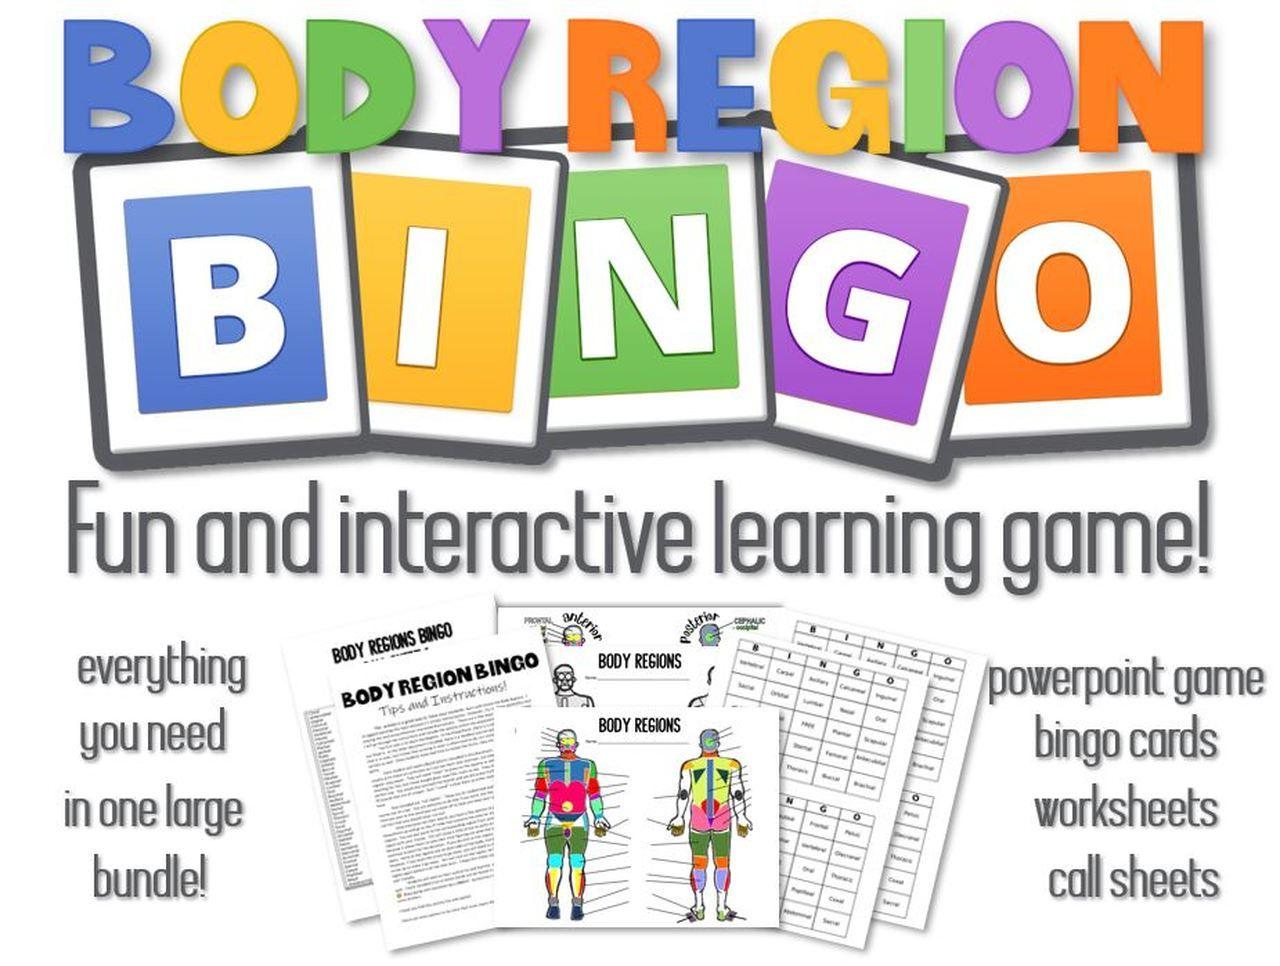 Body Region Bingo Powerpoint Game Bingo Card Call